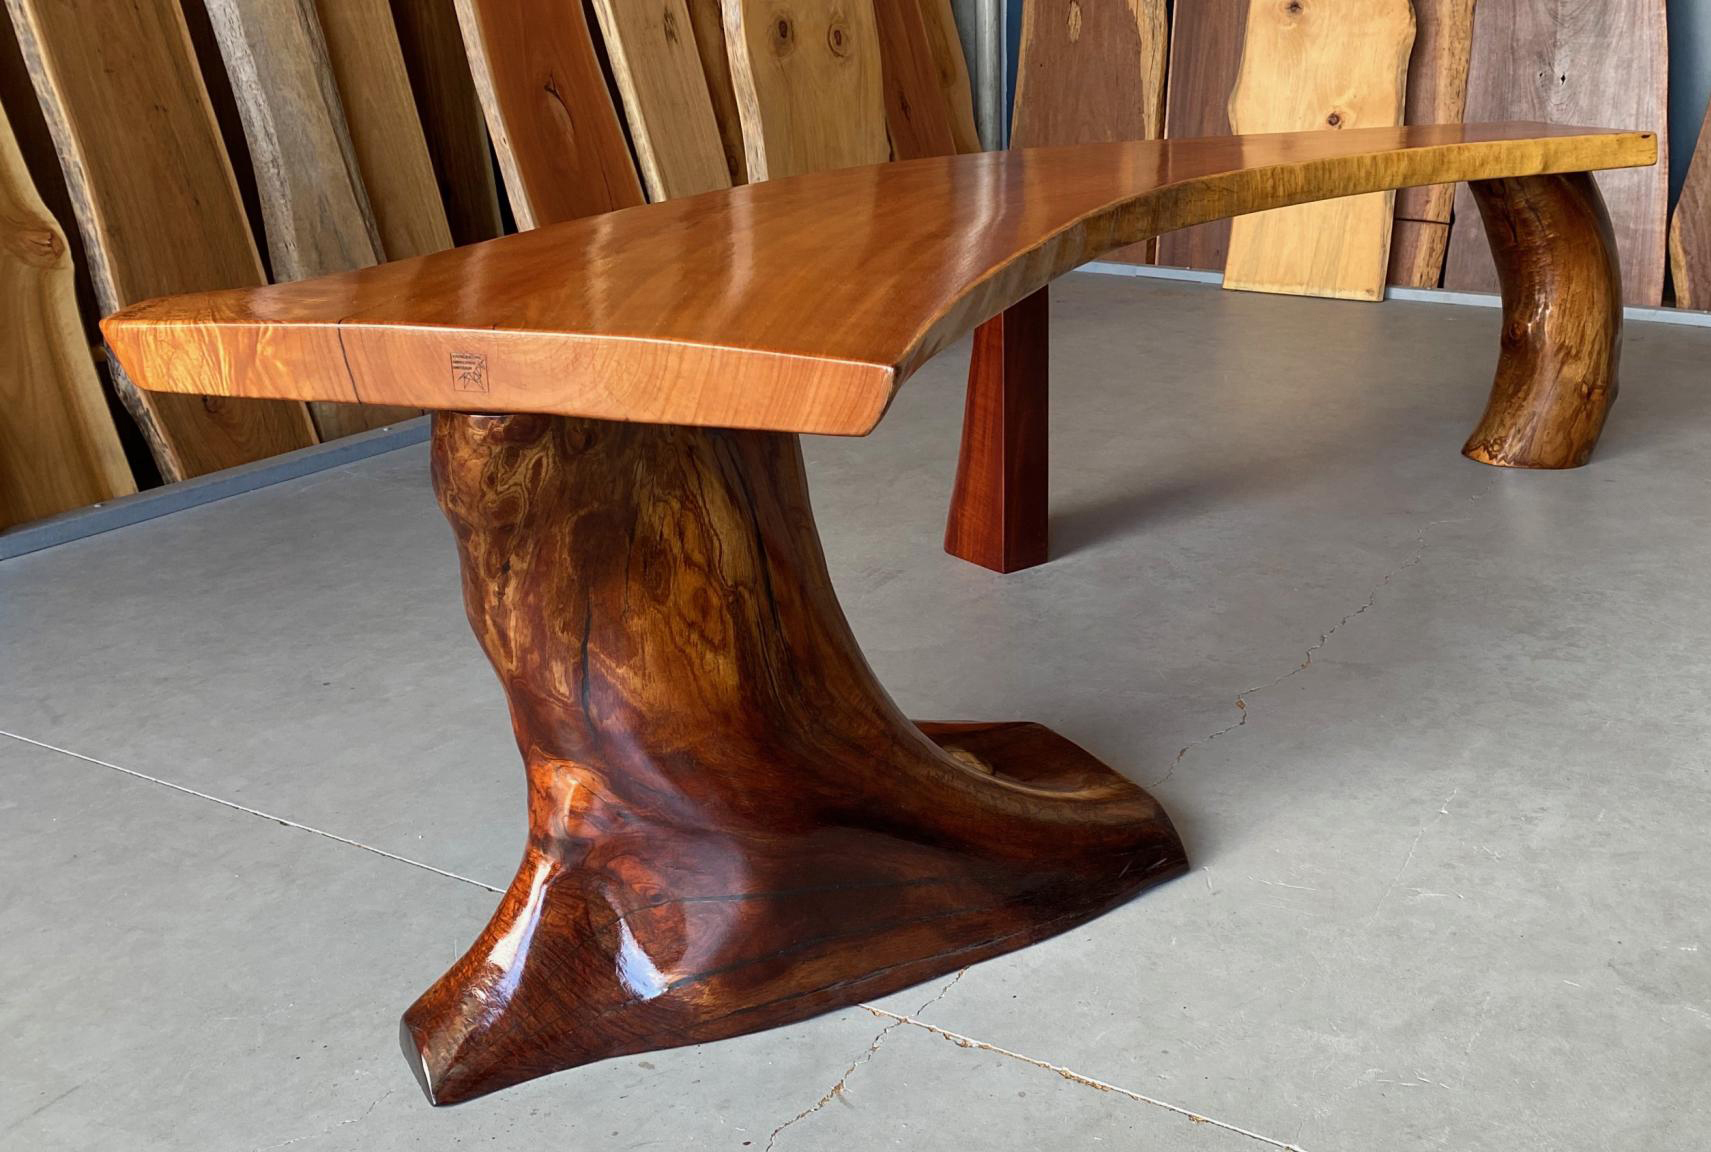 Queensland Red Cedar Slabs available at TRADEWARE Building Supplies